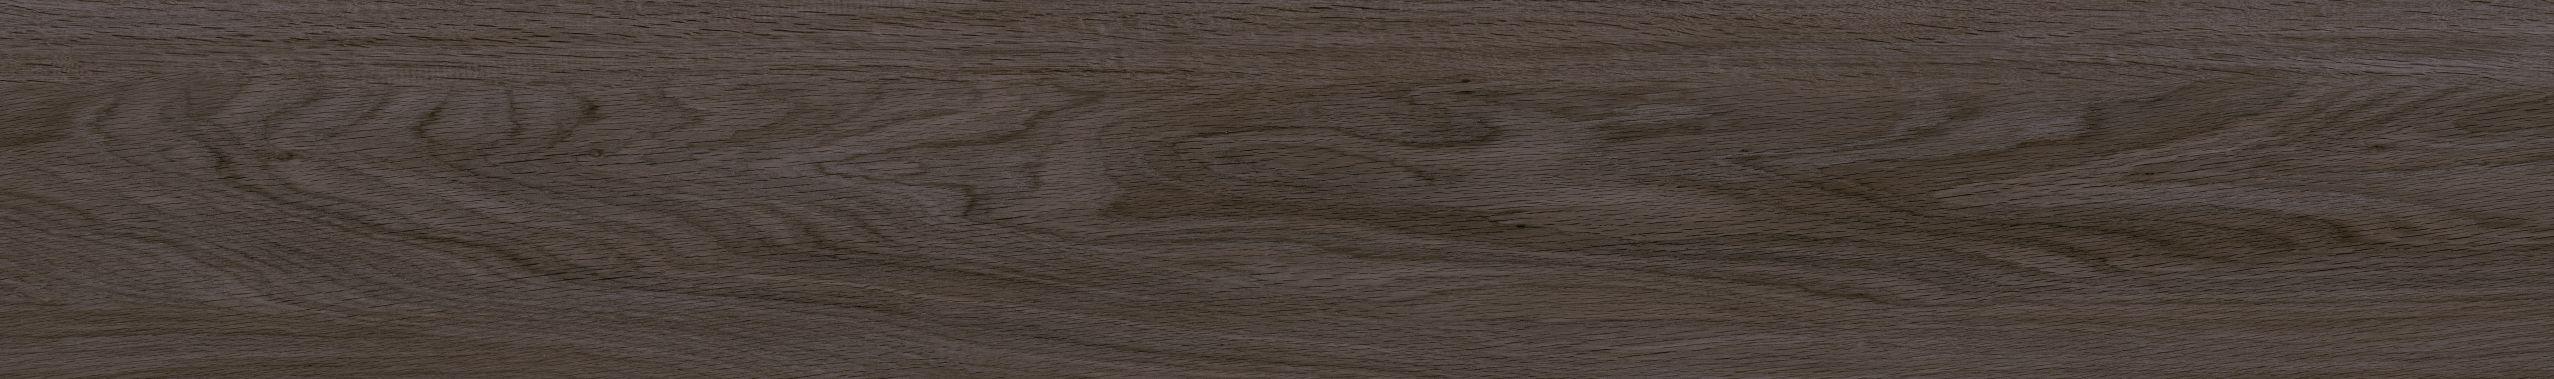 Panele winylowe LVT modulari ® WOOD DRYBACK 19,6 x 132 cm 24890